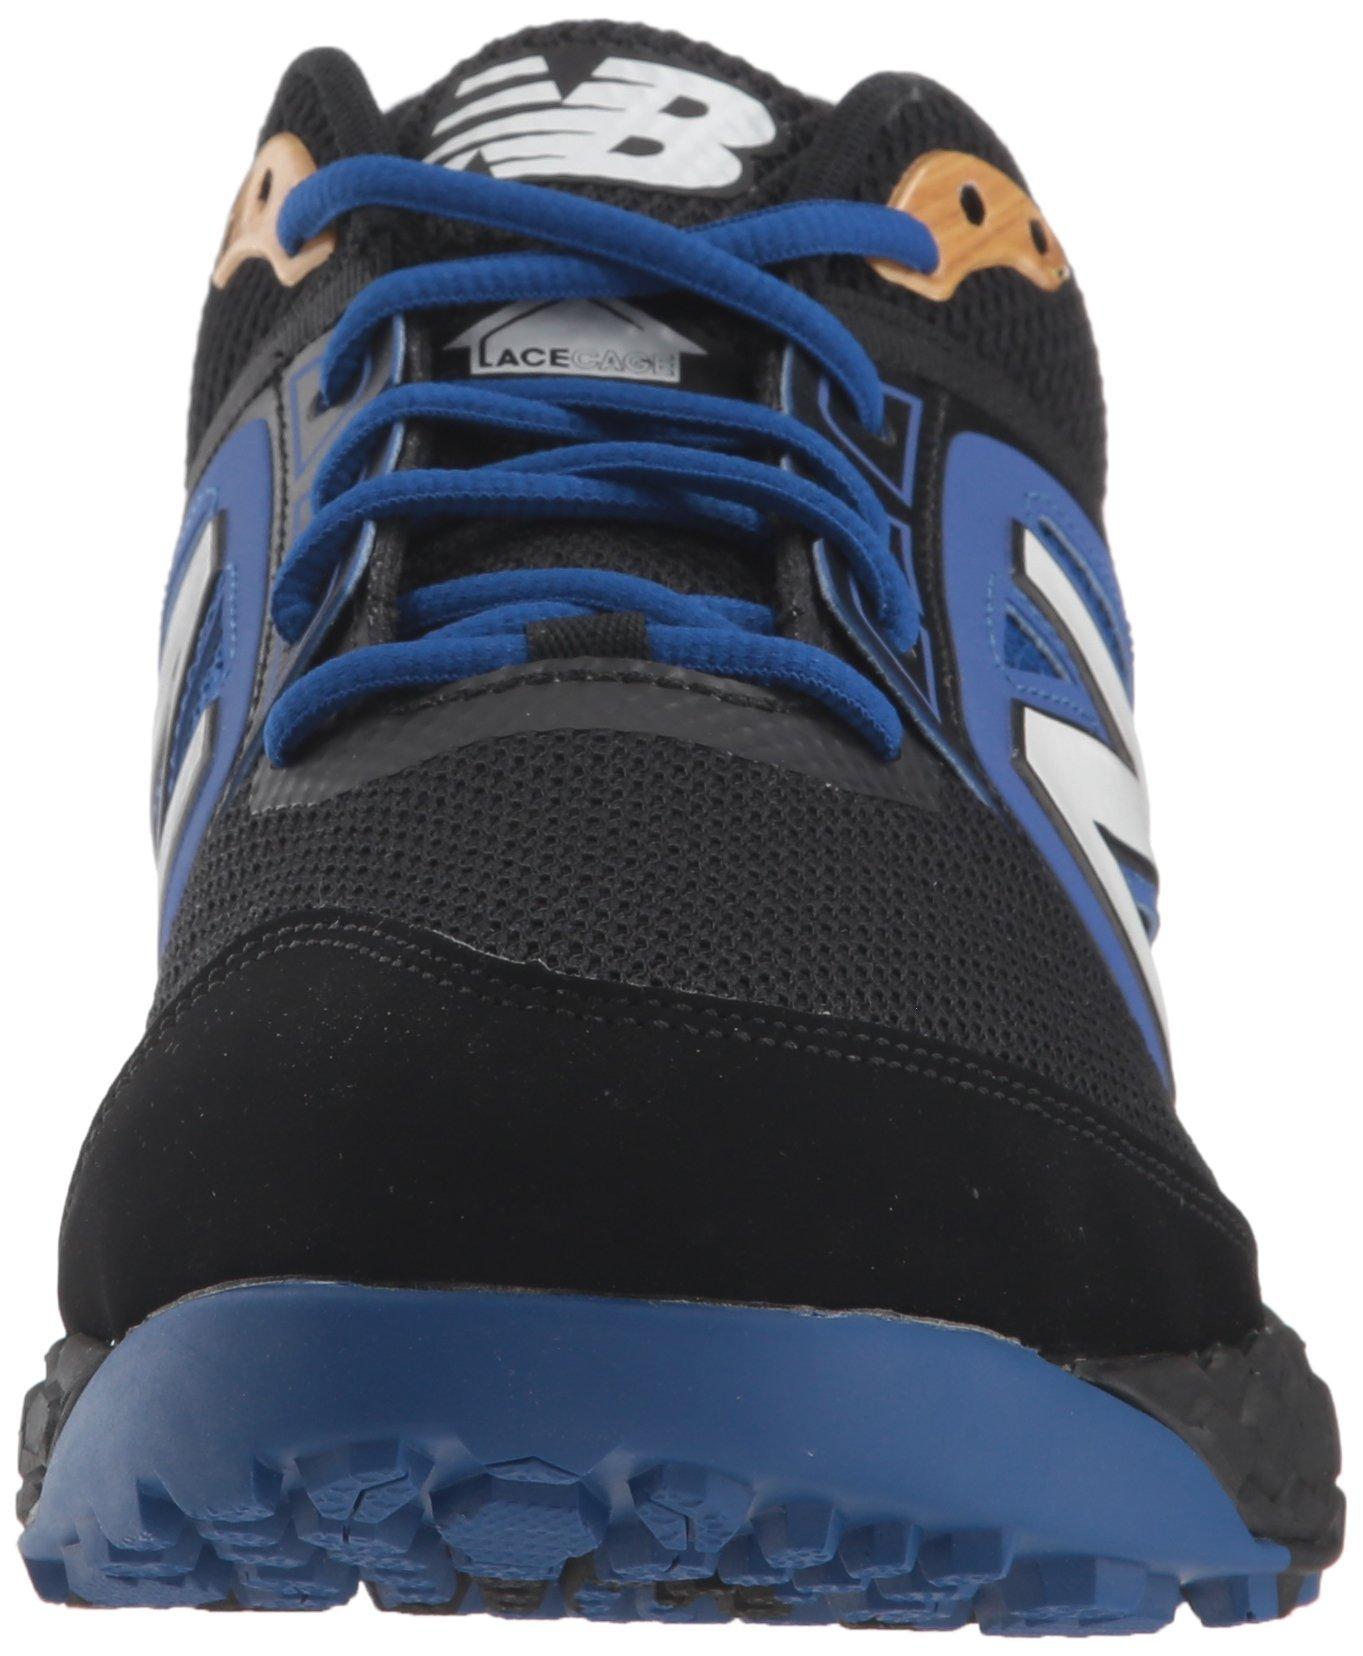 New Balance Men's 3000v4 Turf Baseball Shoe, Black/Blue, 5 D US by New Balance (Image #4)